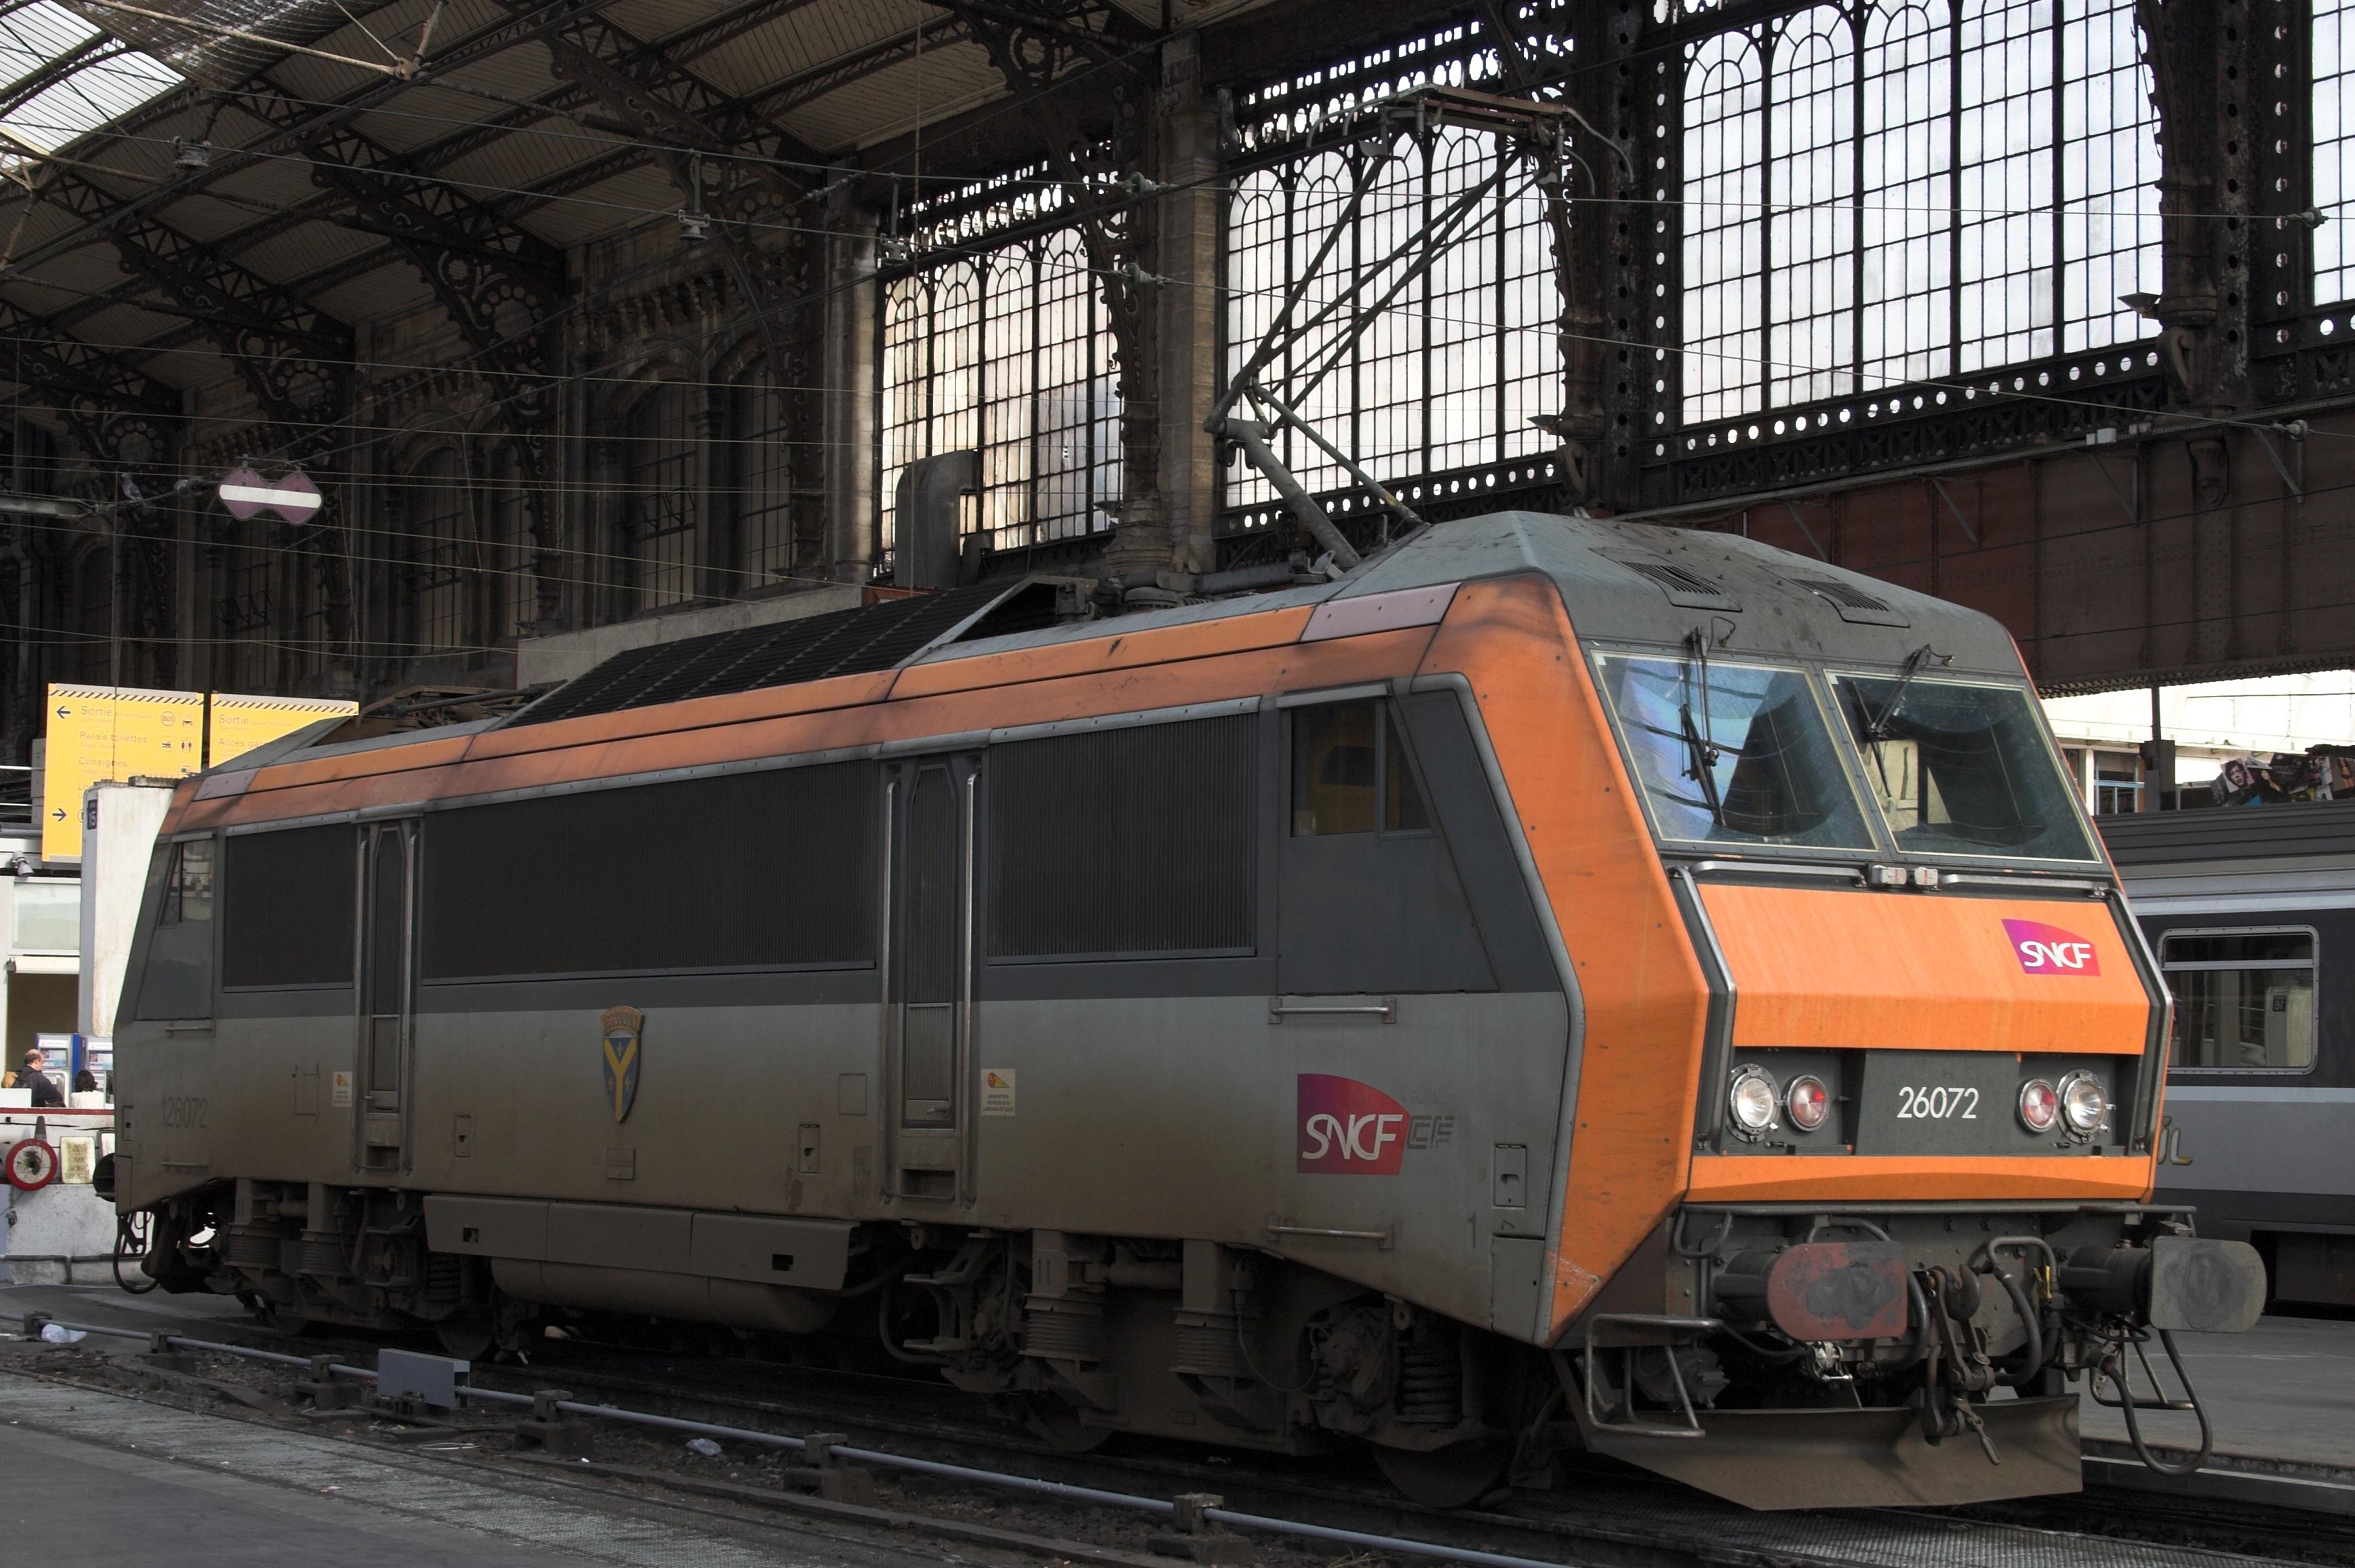 Forum Train Patine Peinture Decor